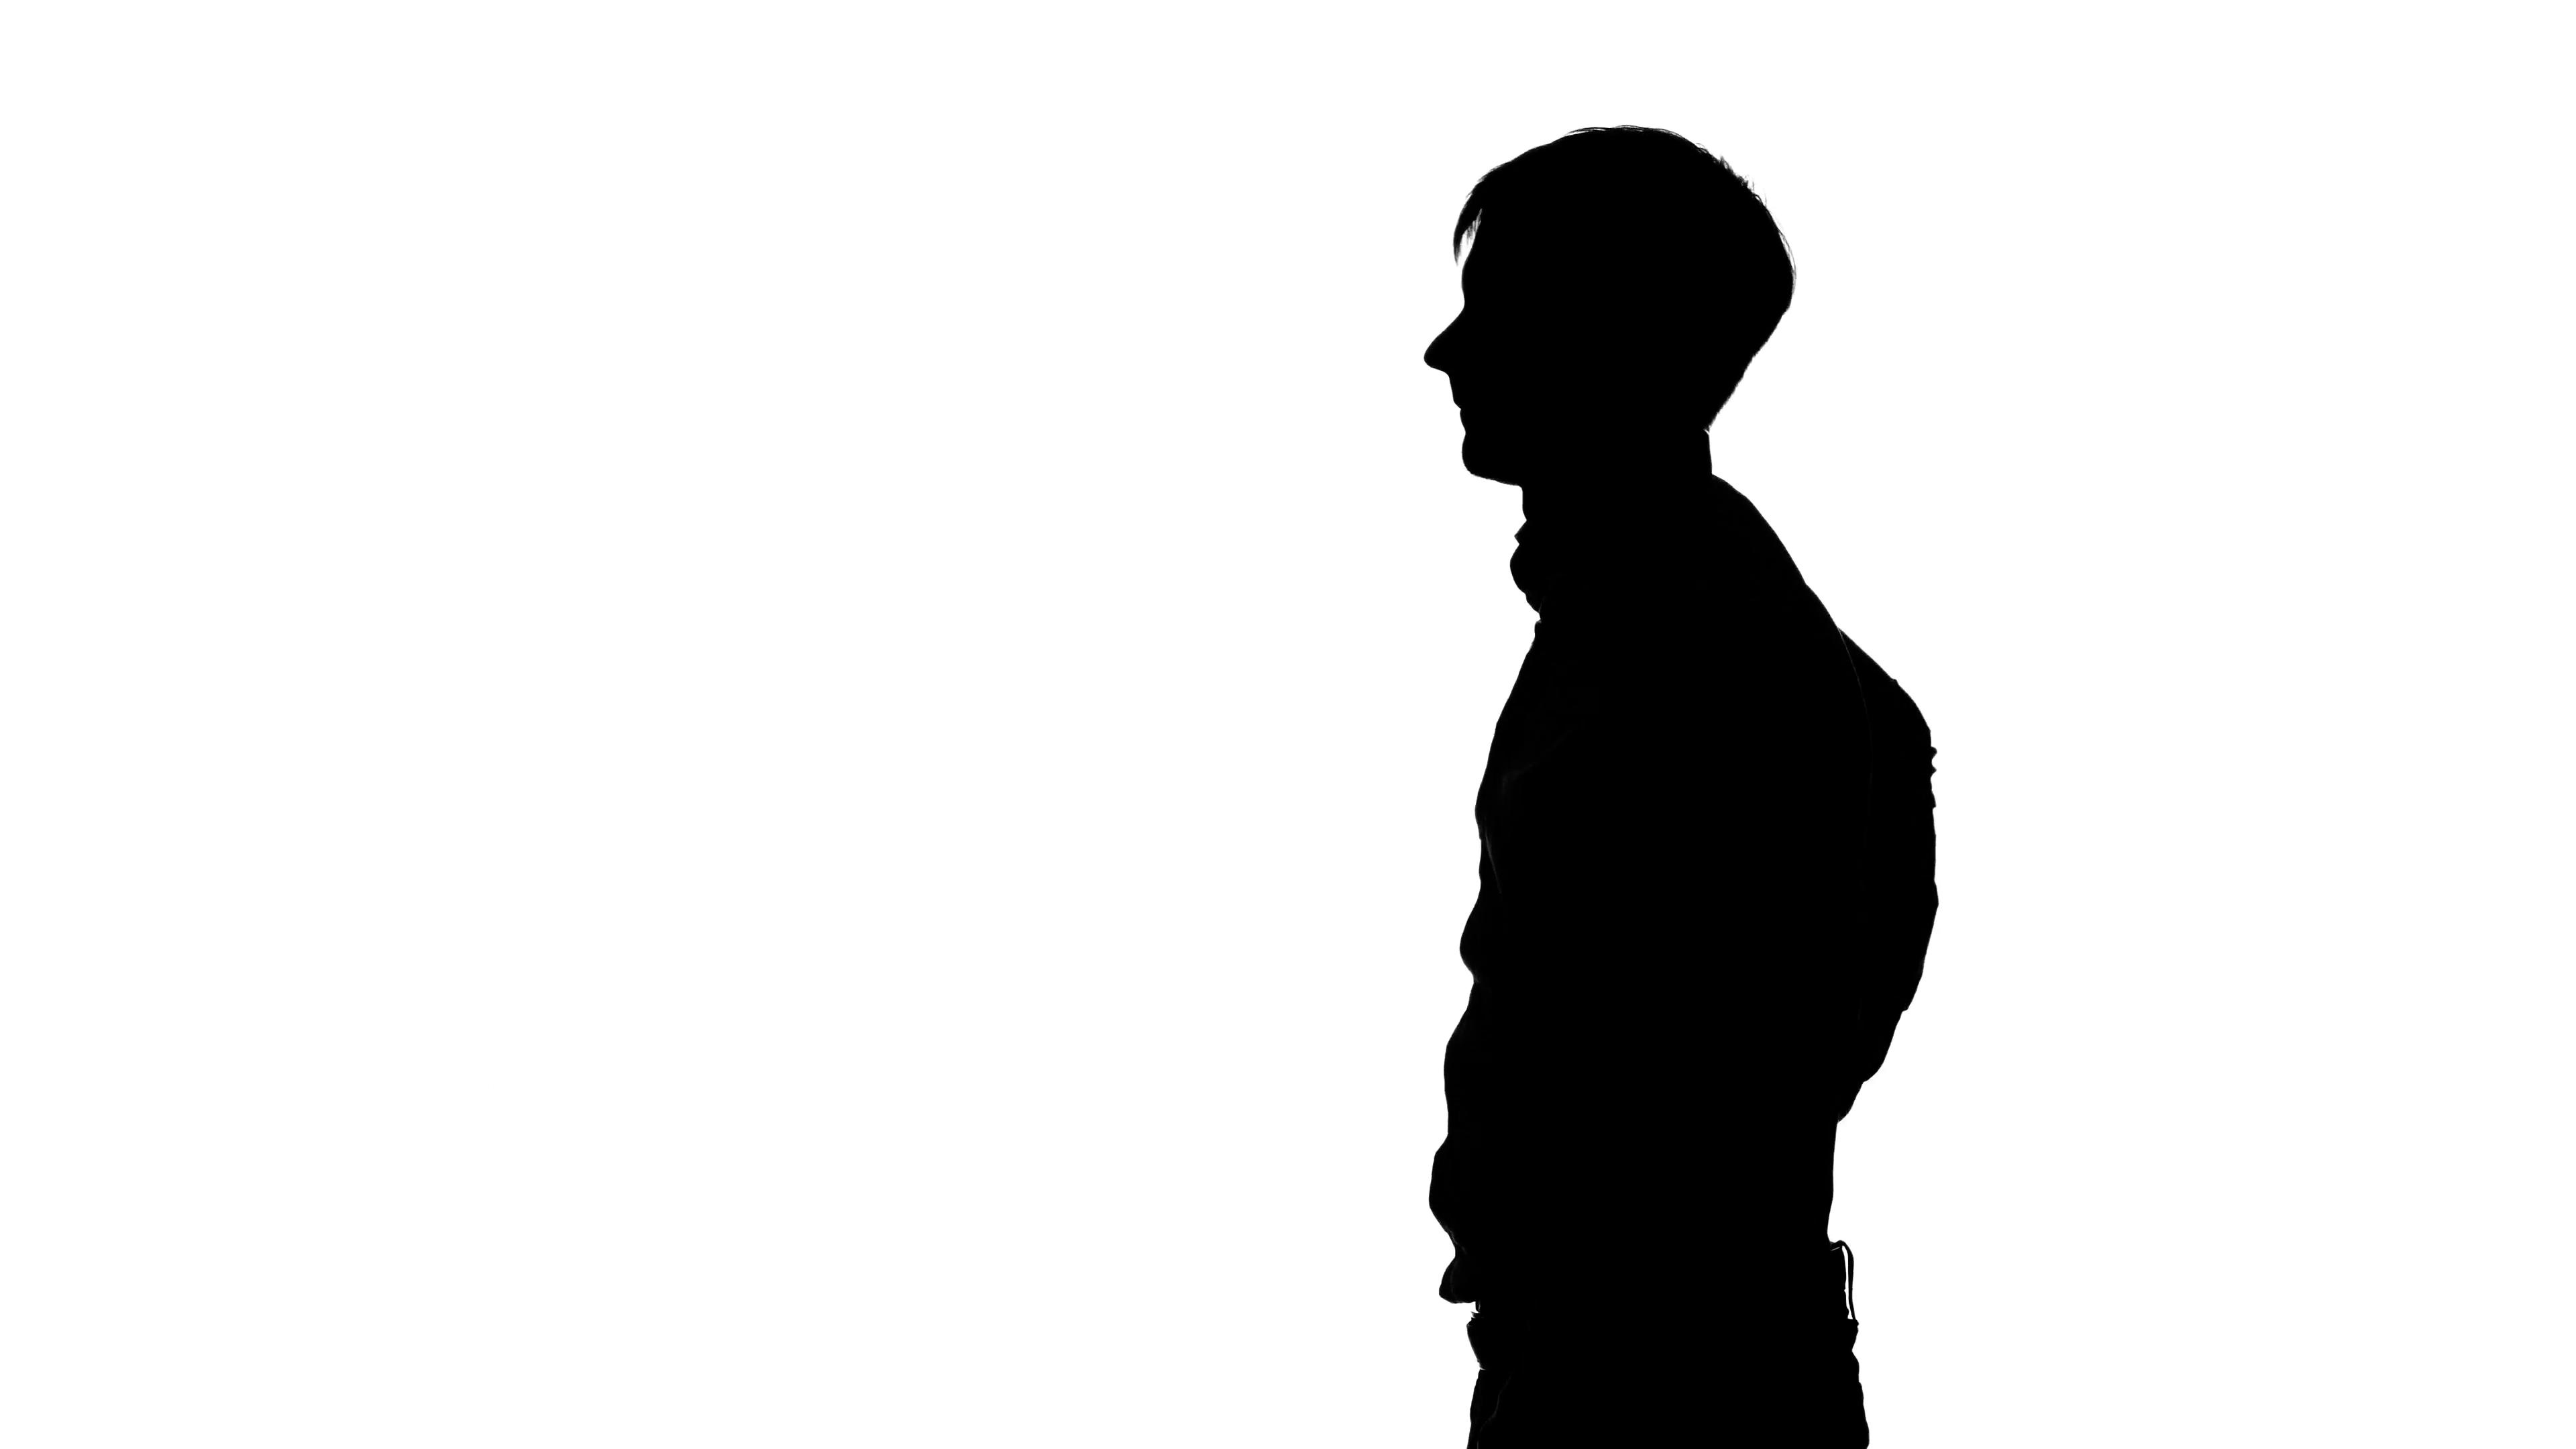 3840x2160 Man Shoots A Gun. Silhouette. White Stock Video Footage